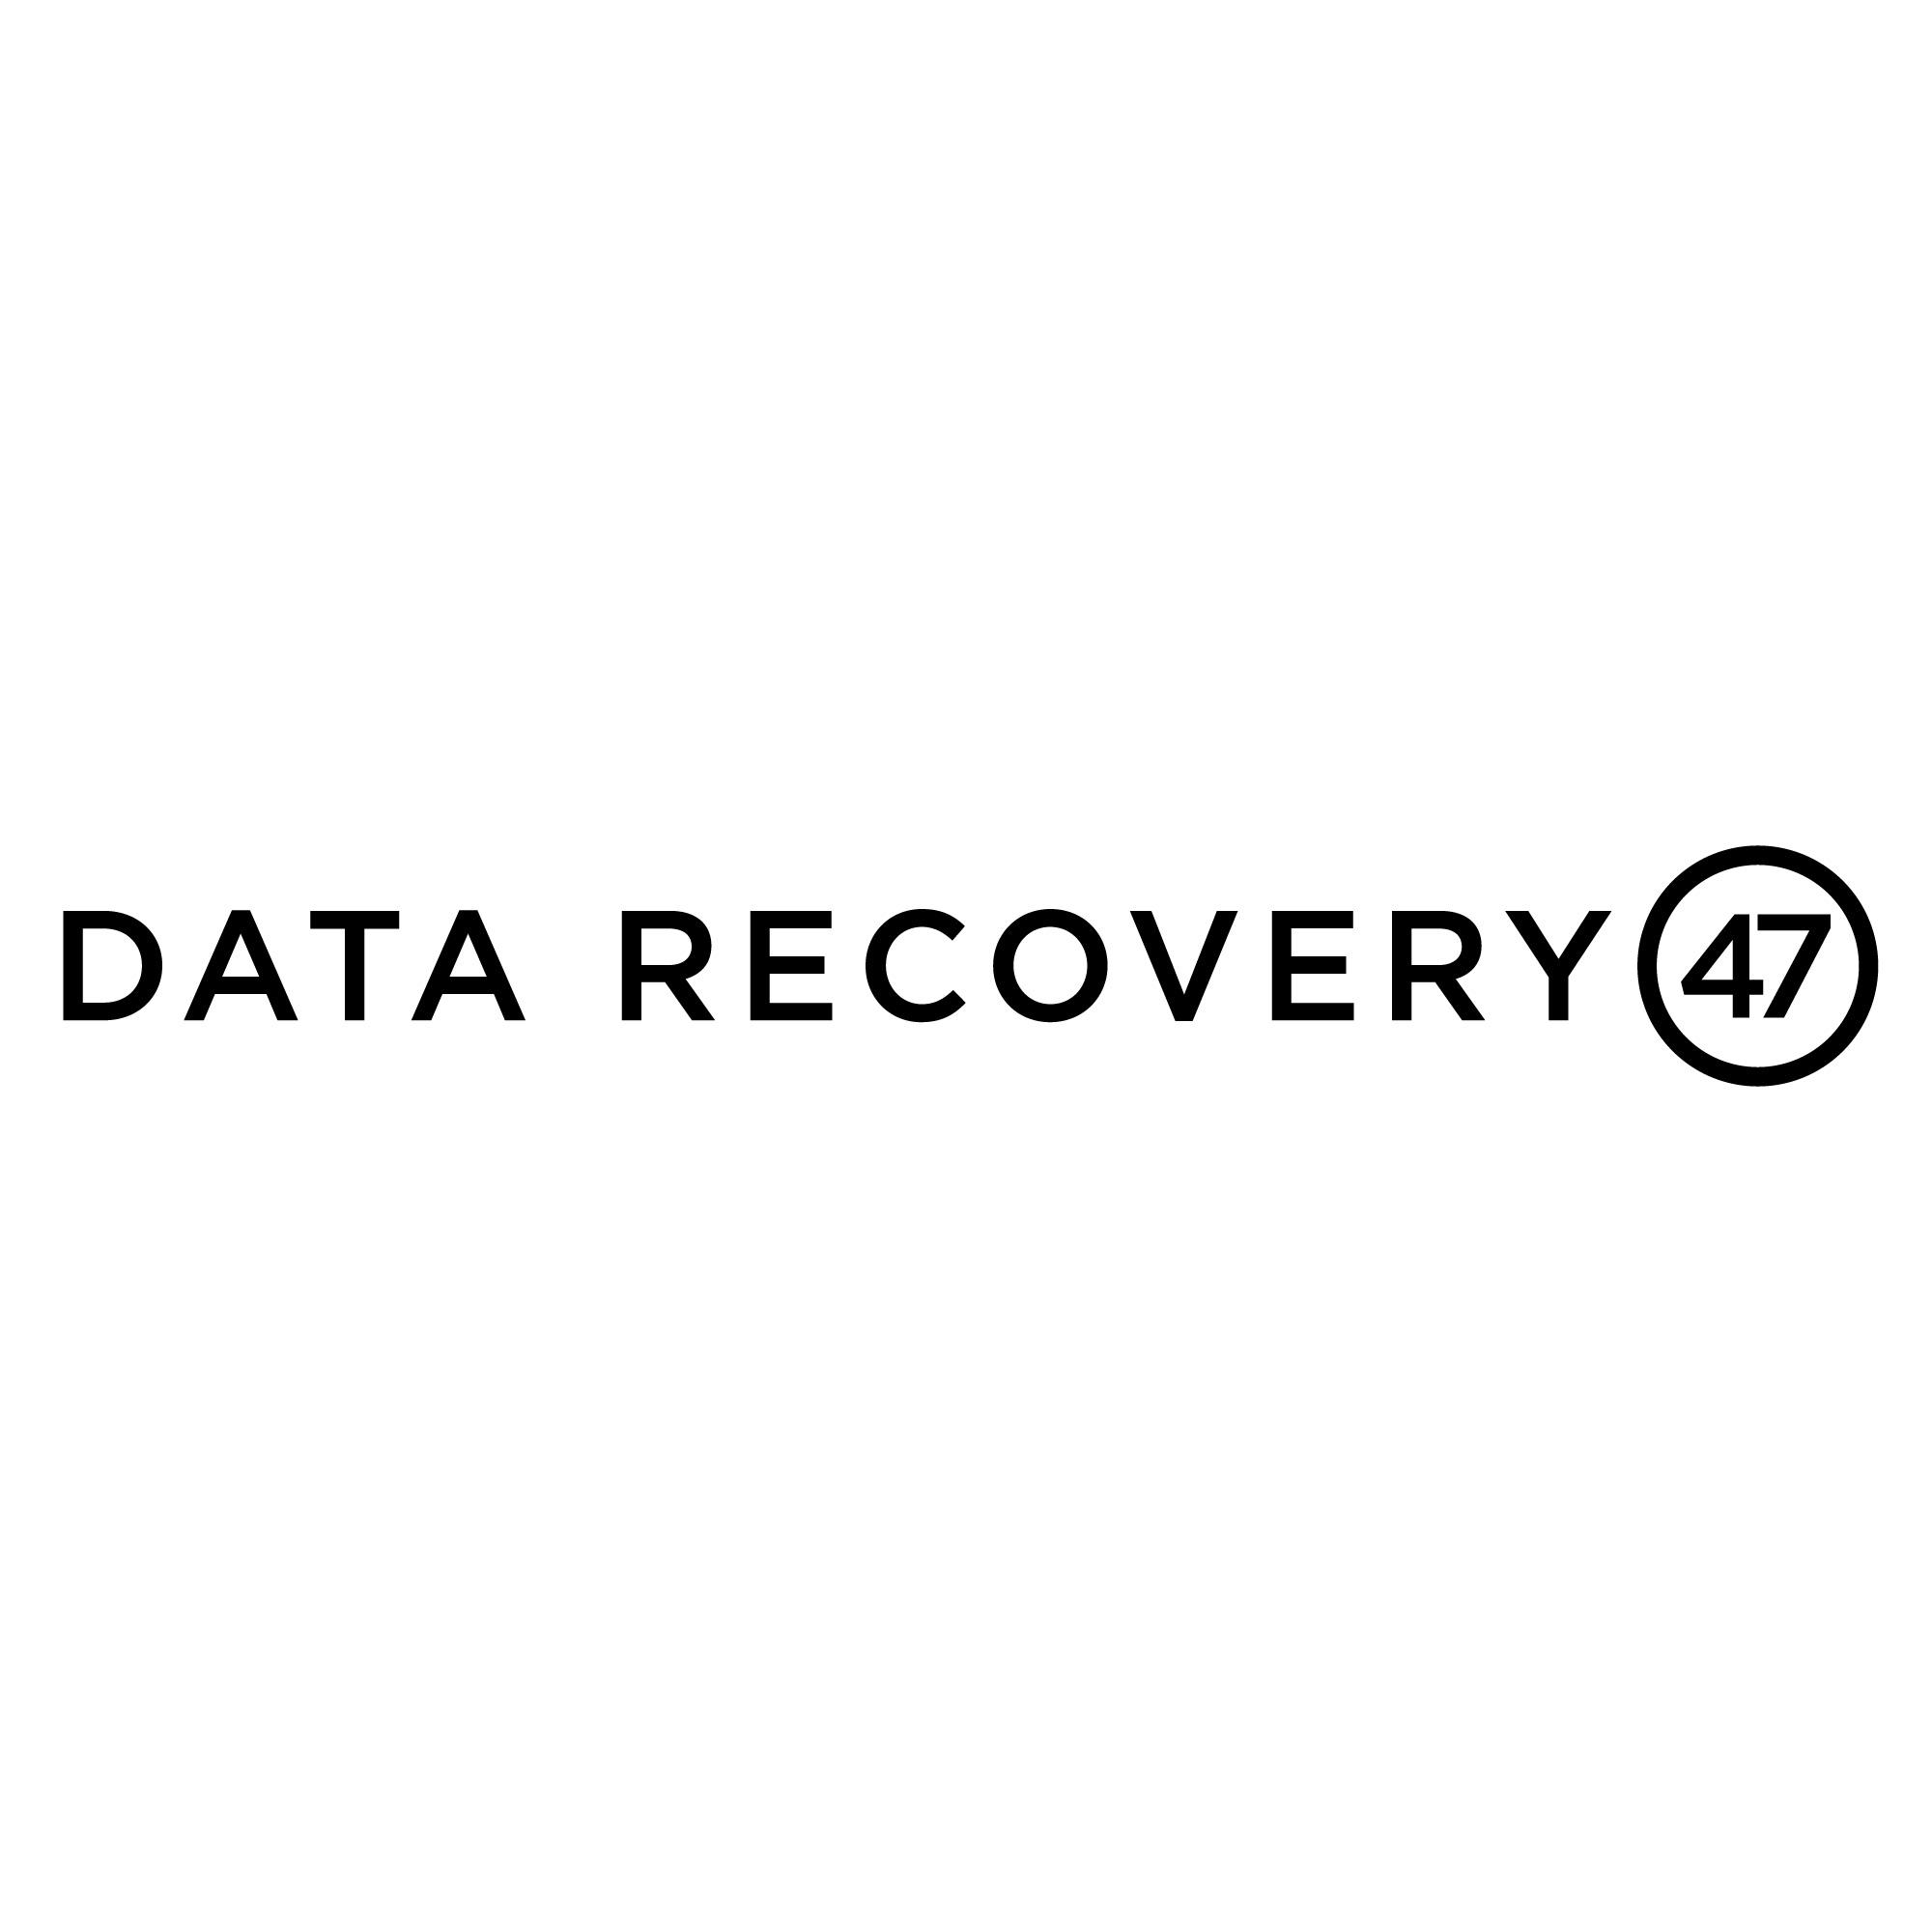 data recovery service Freelance Photographers Nightmare, data recovery service needed DataRecovery logo